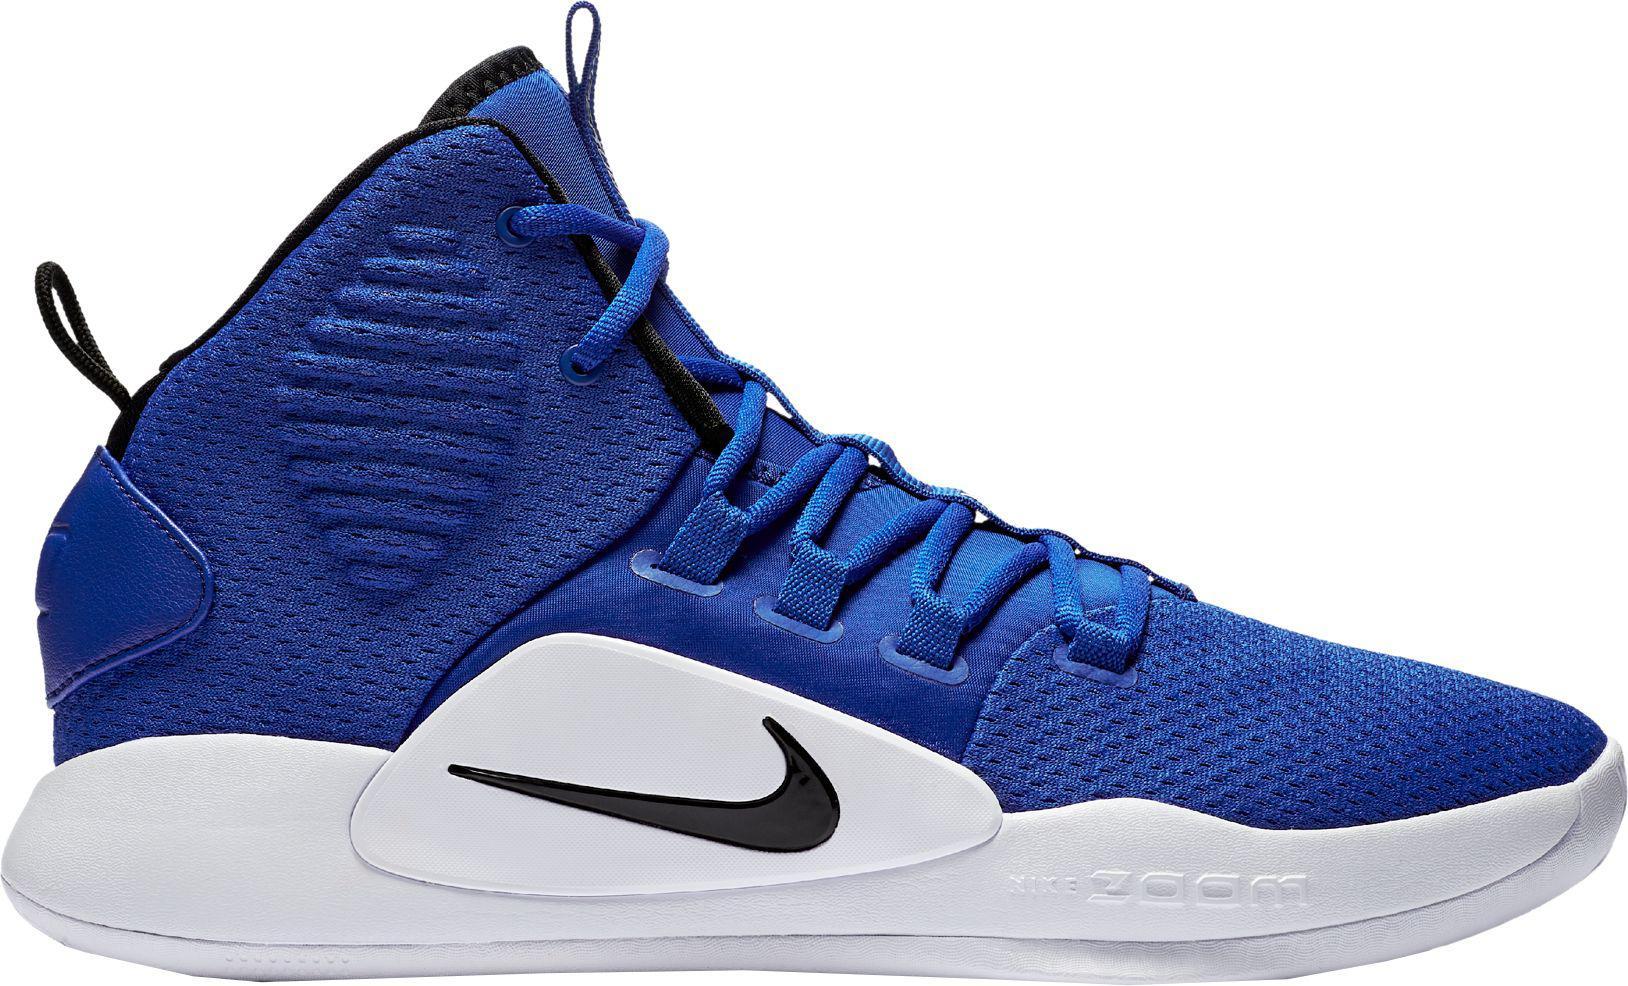 e2ecbaa270e Nike Hyperdunk X Mid Tb Basketball Shoes in Blue for Men - Lyst